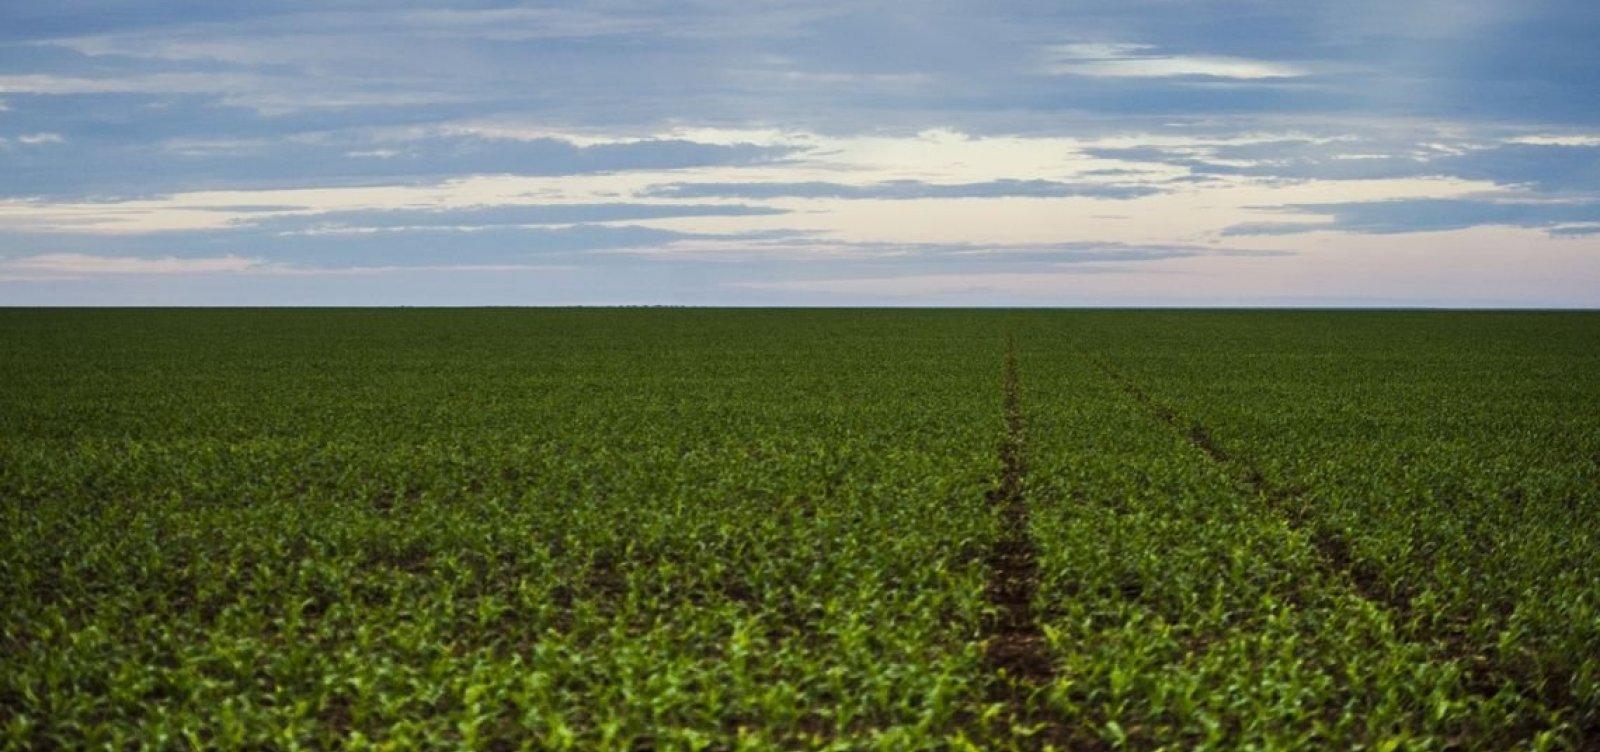 [Governo autoriza mais 57 agrotóxicos e total de registros chega a 439 só neste ano]